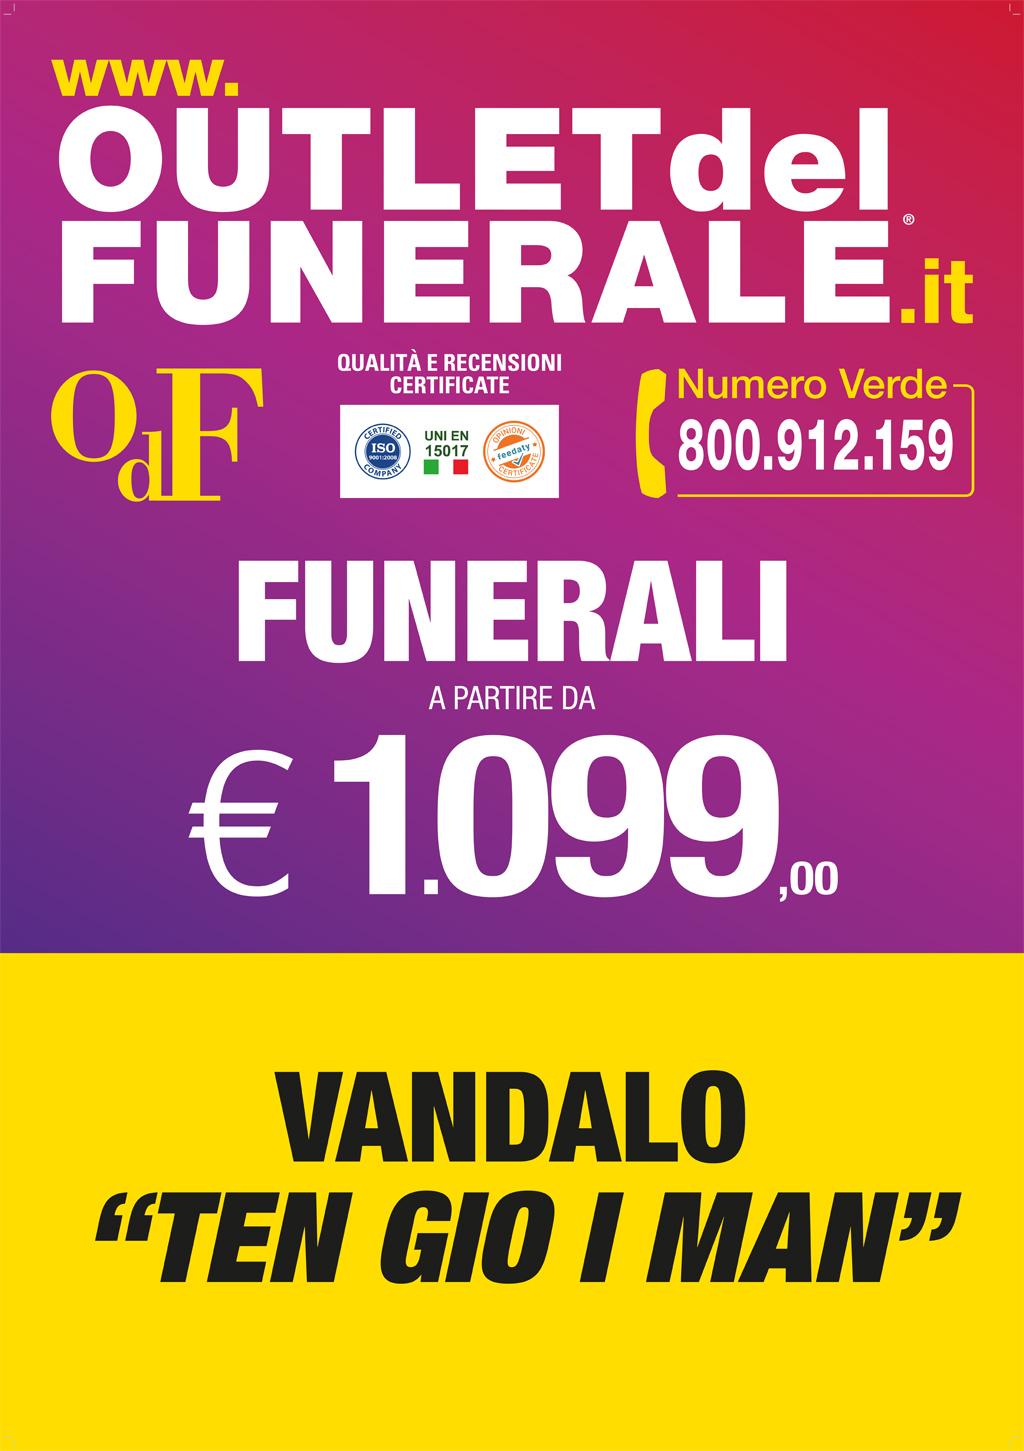 Contrasto al vandalismo in dialetto milanese: «Vandalo, ten gio i man»